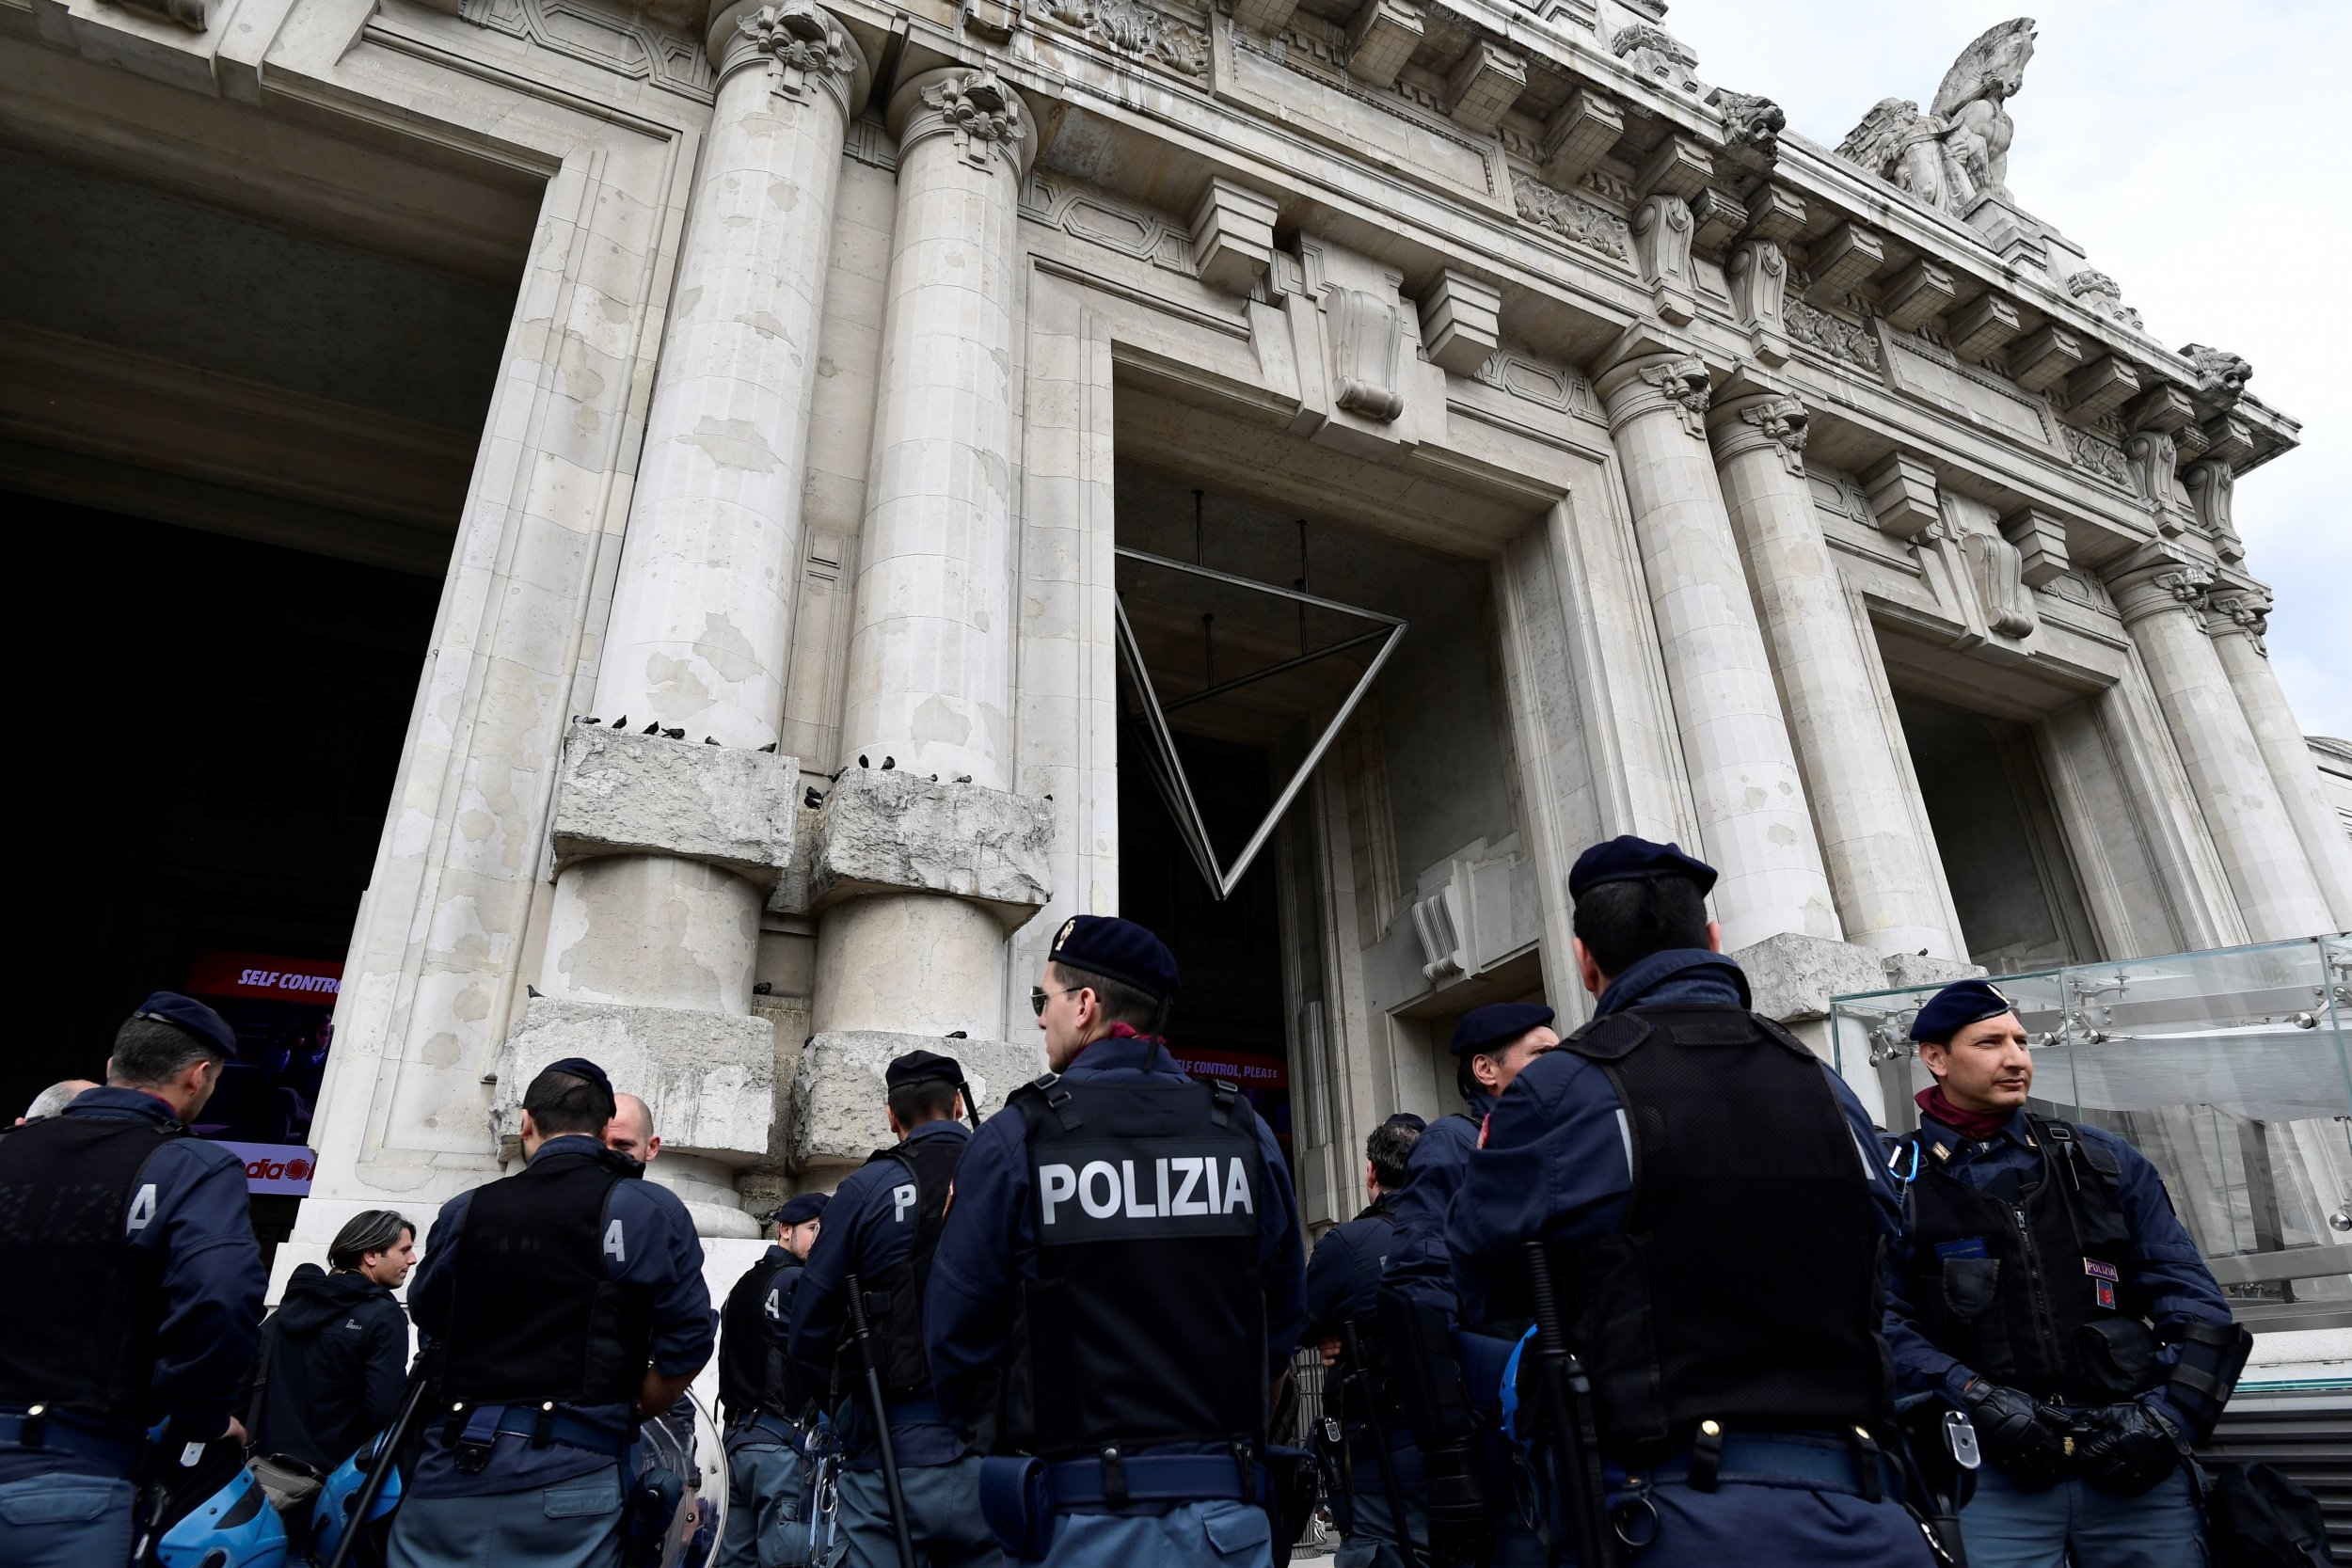 08_05_Milan central station_01